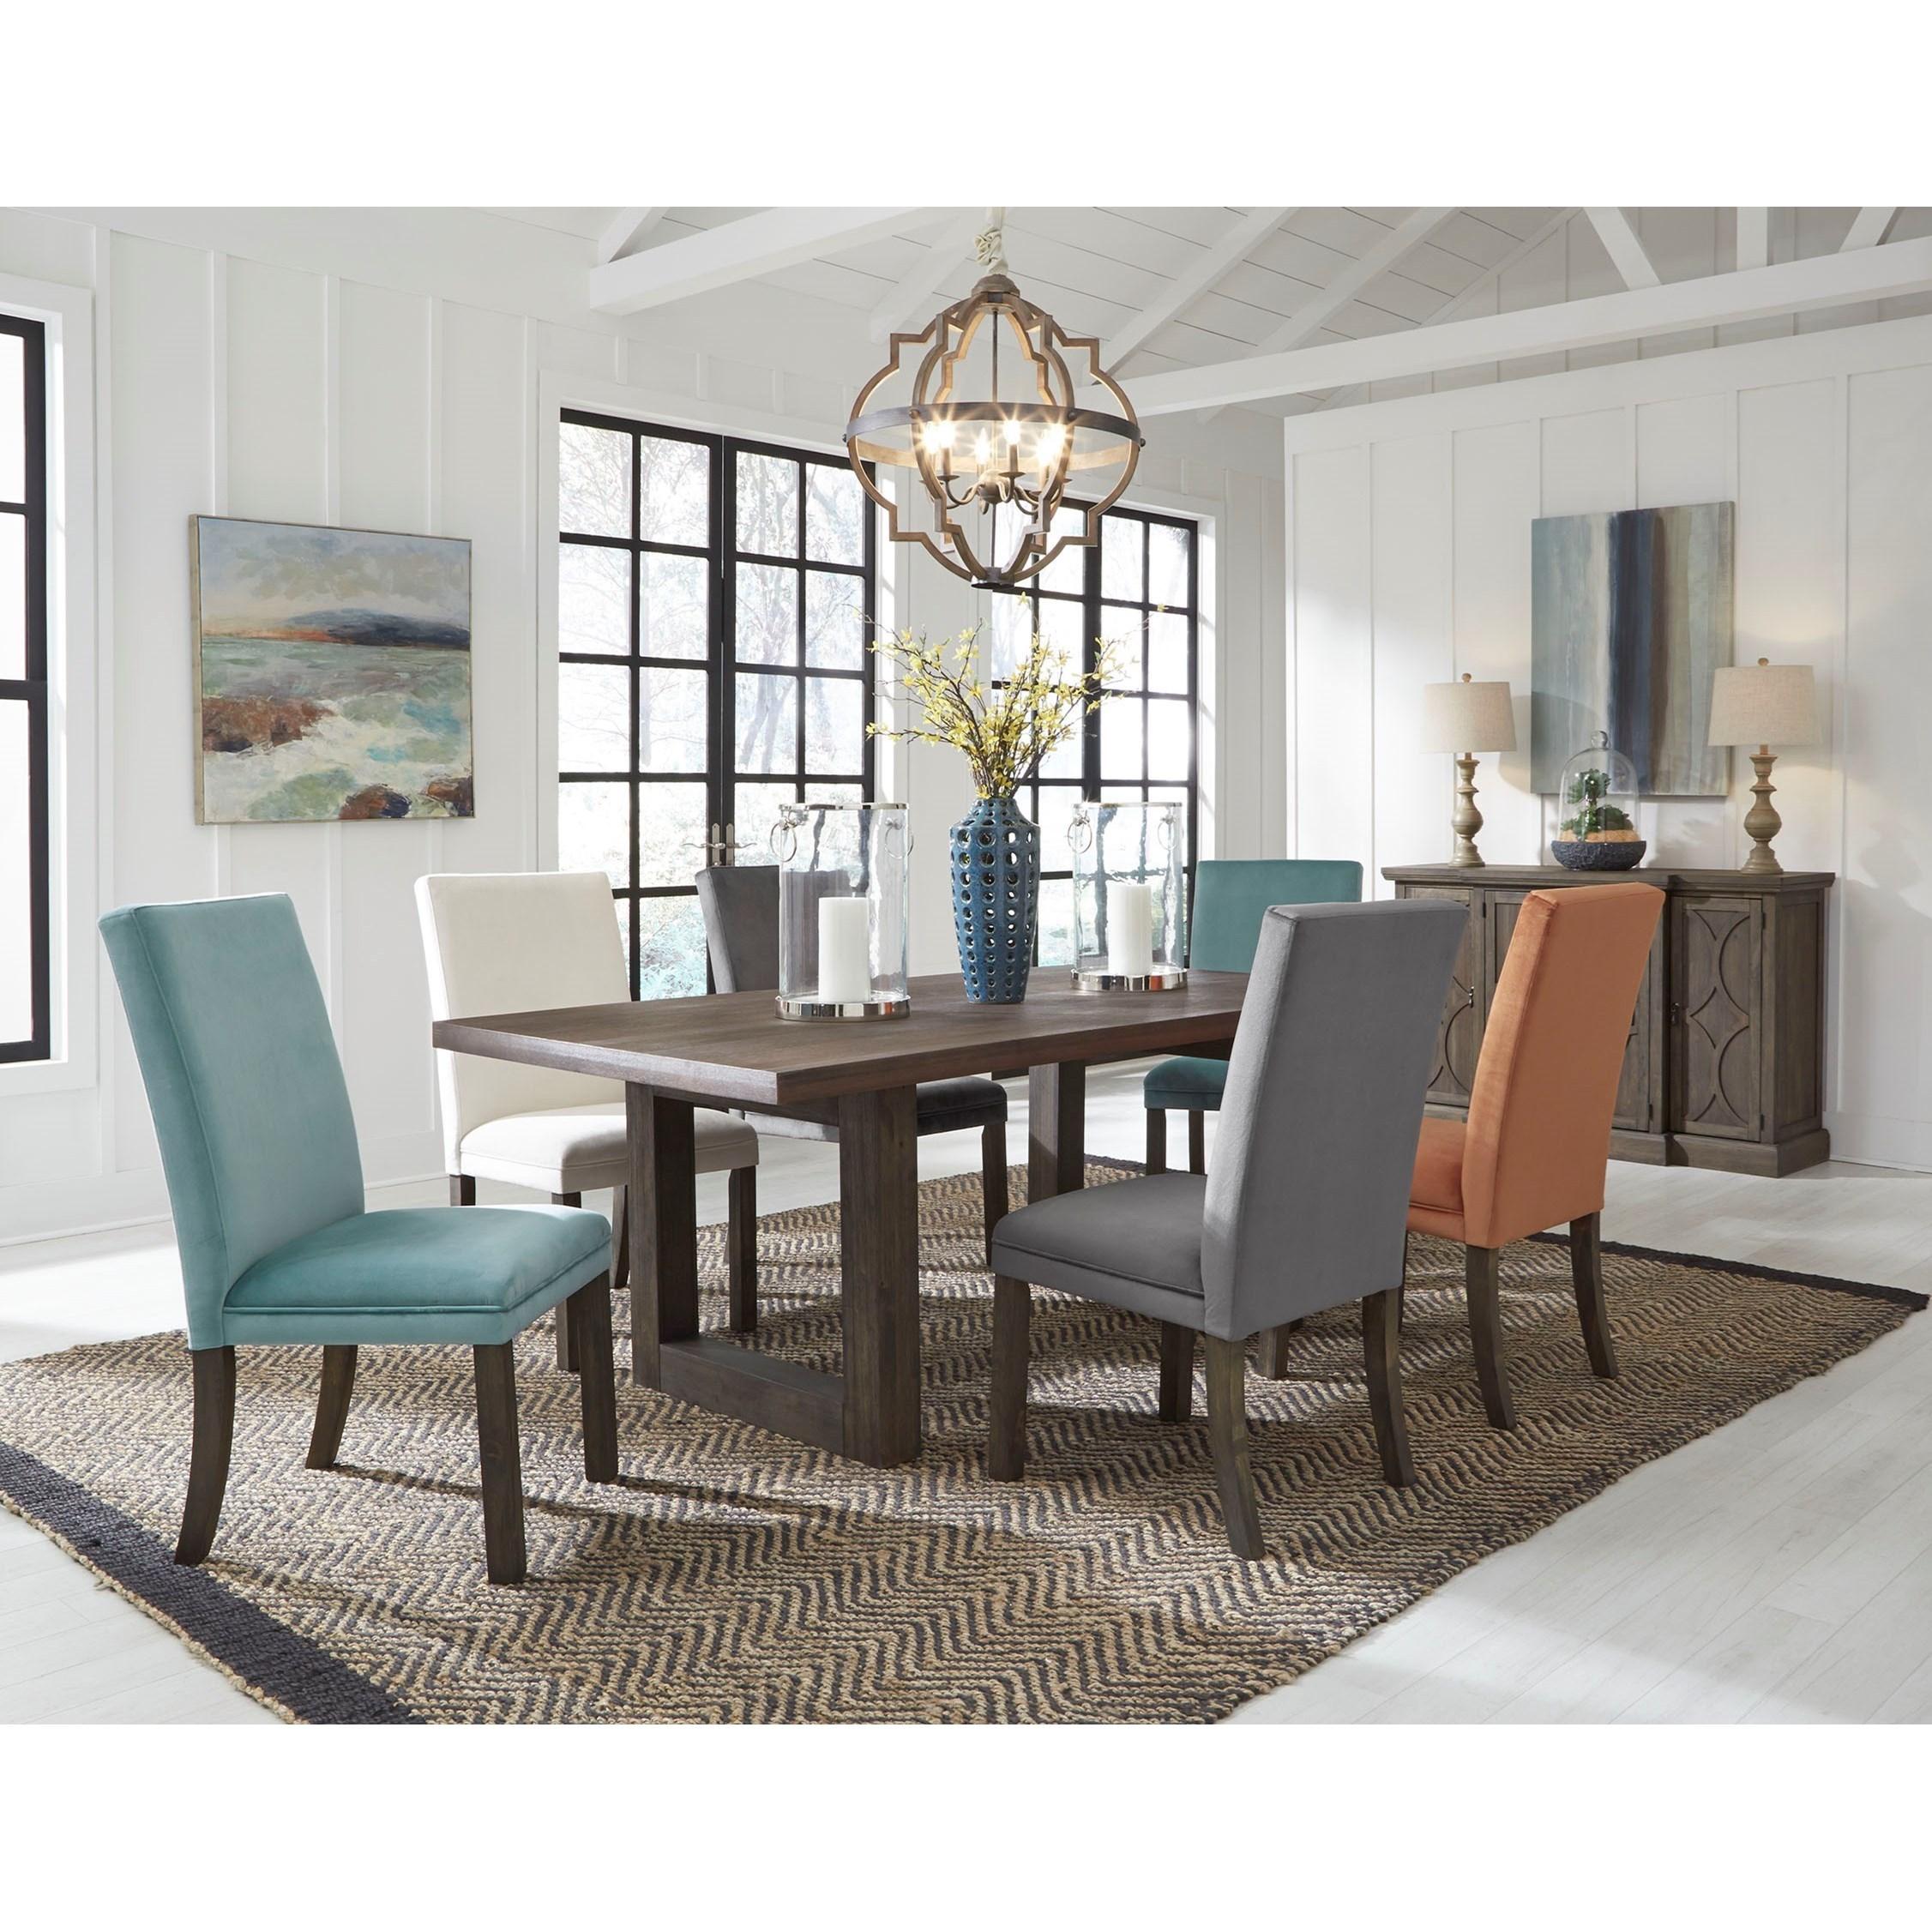 Ordinaire Standard Furniture Trenton Casual Dining Room Group